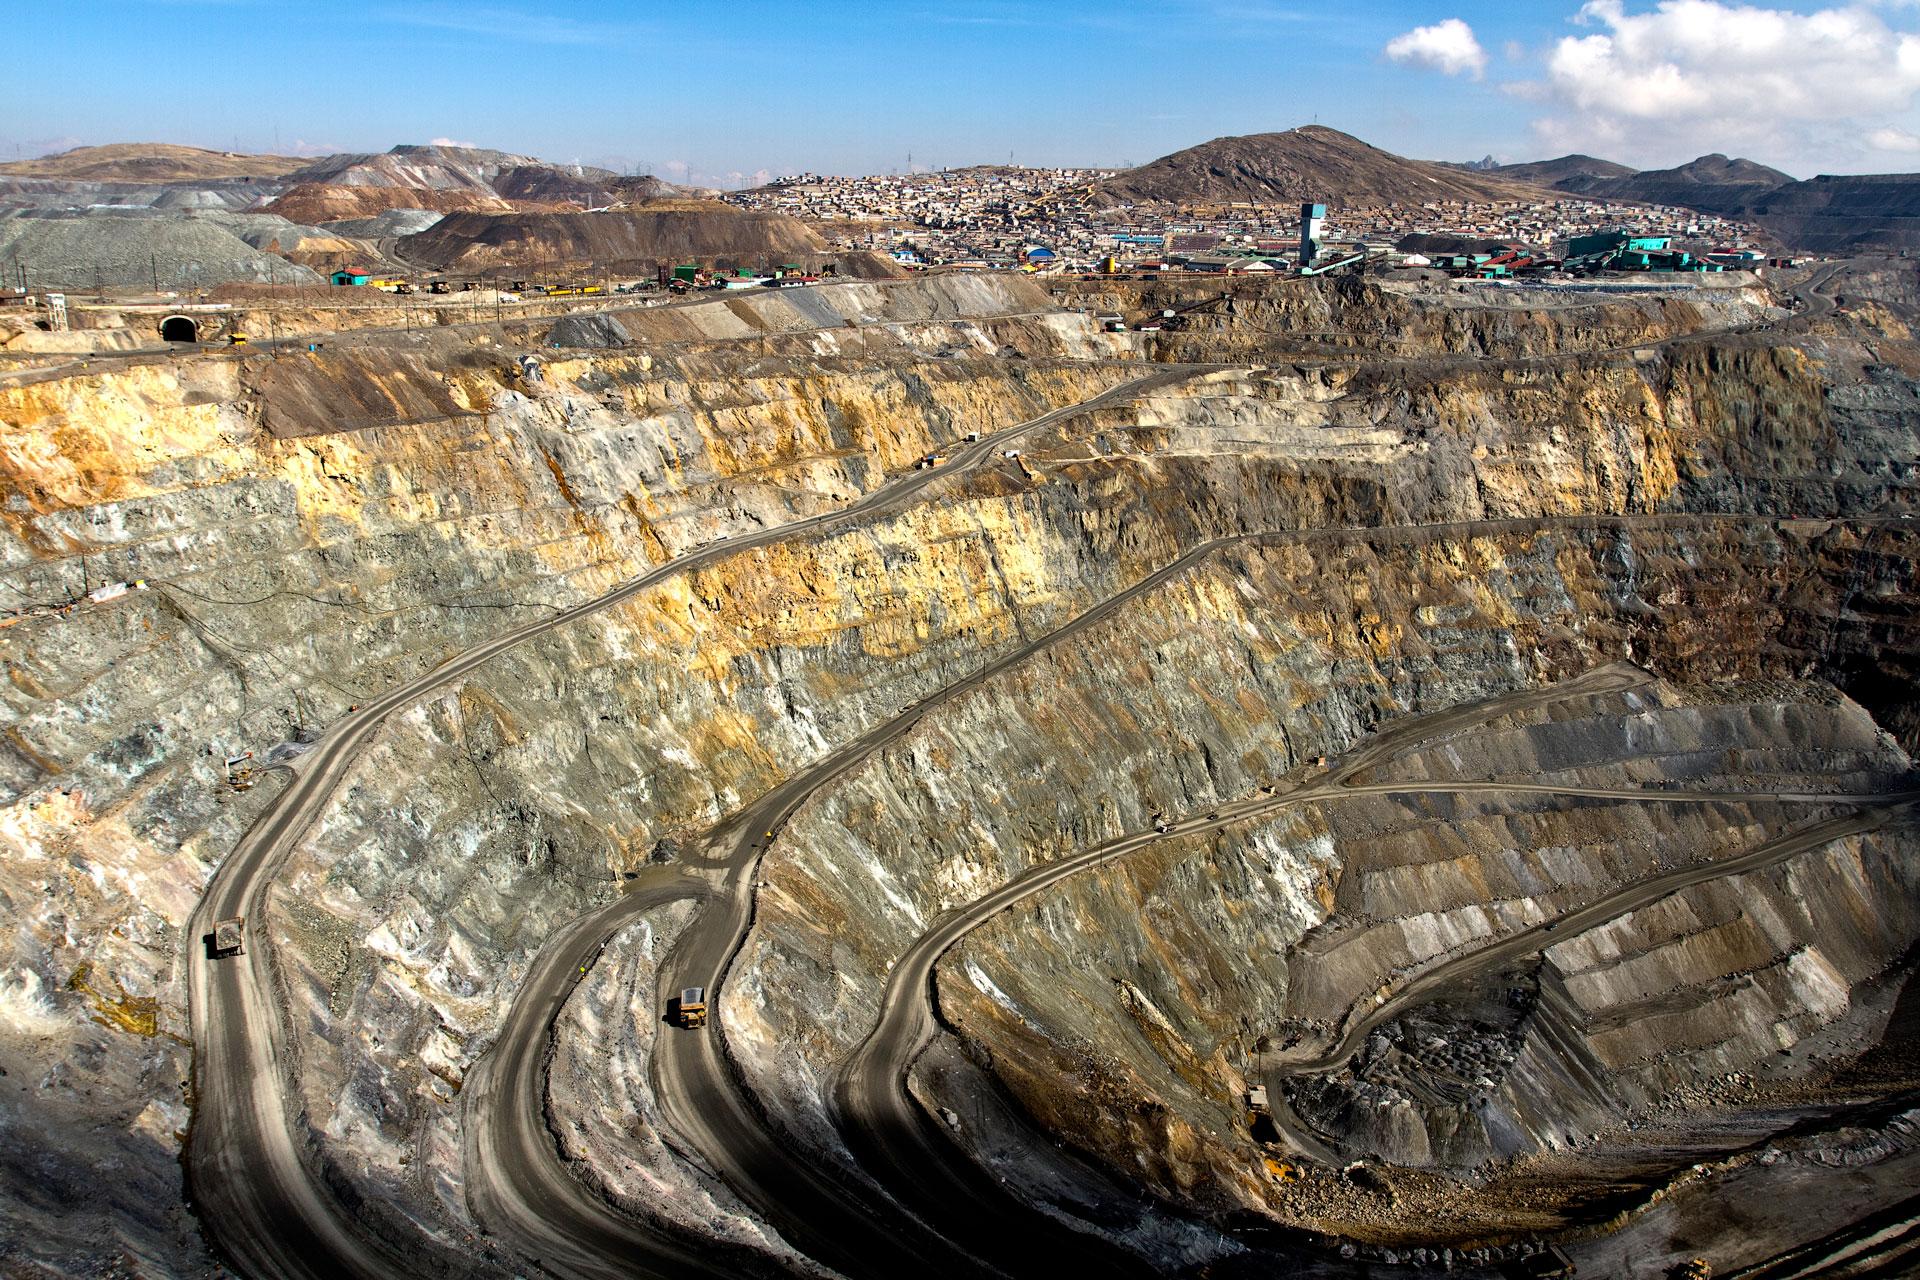 open-pit-mine-cerro-de-pasco-peru size 1920x1280